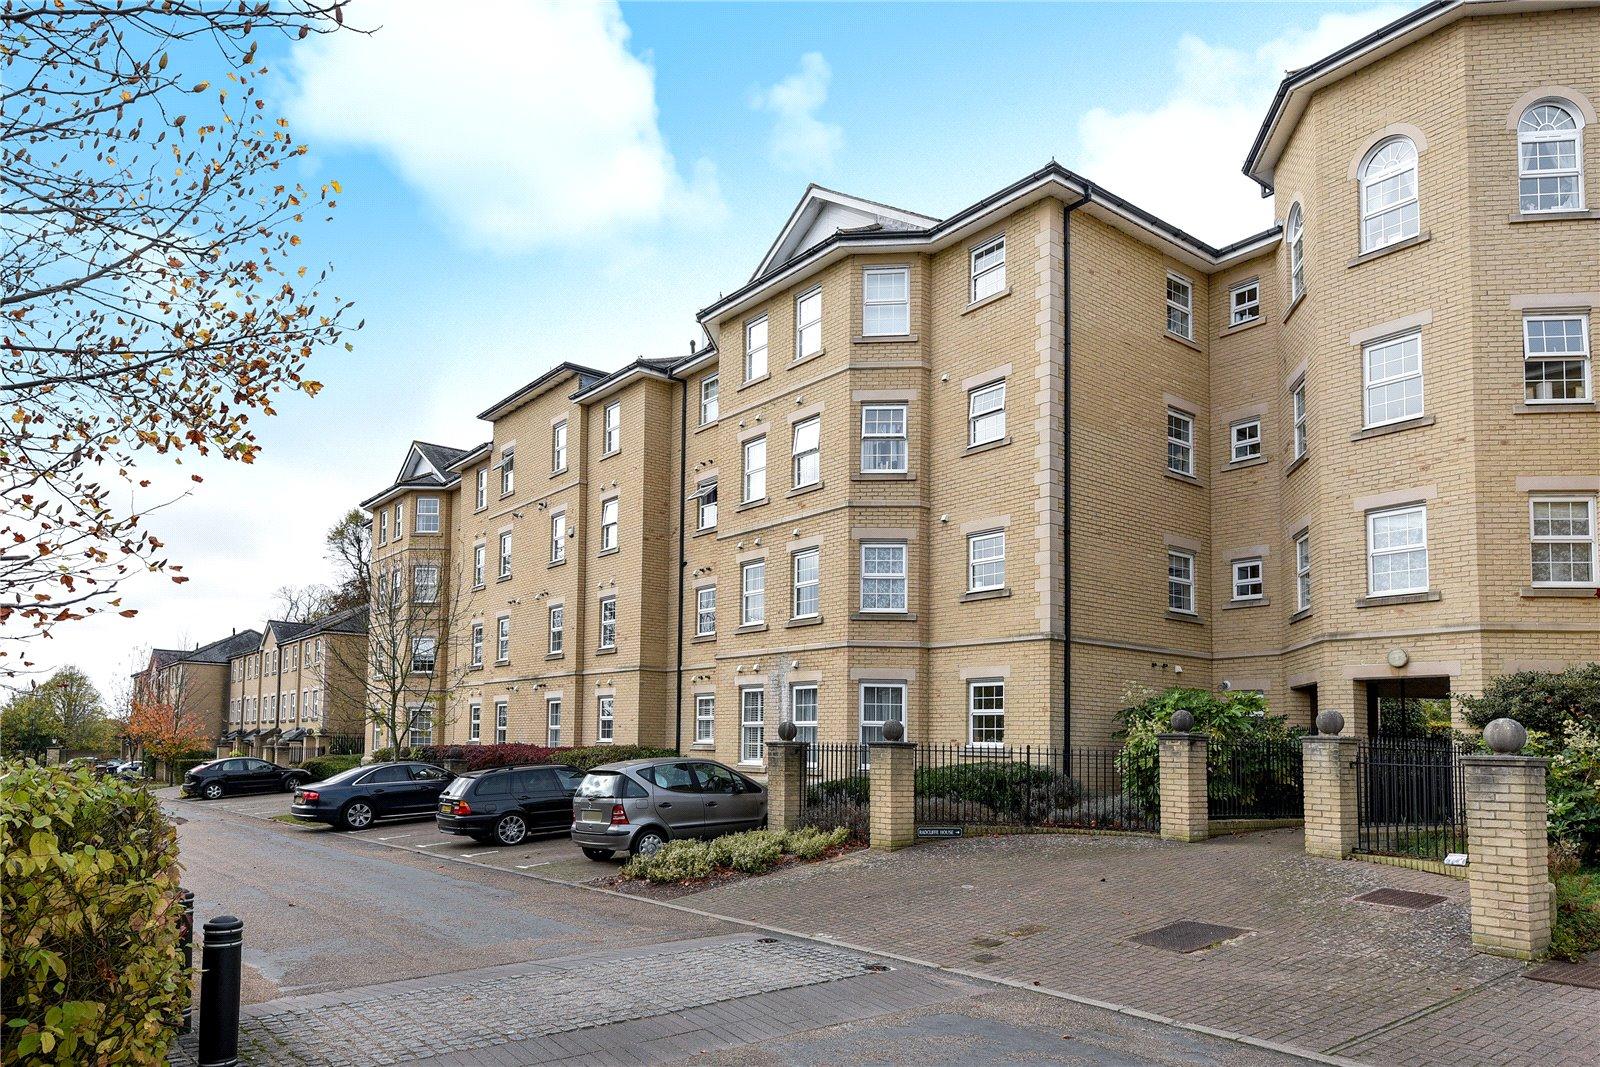 Radcliffe House, Mandelbrote Drive, Littlemore, Oxford, OX4